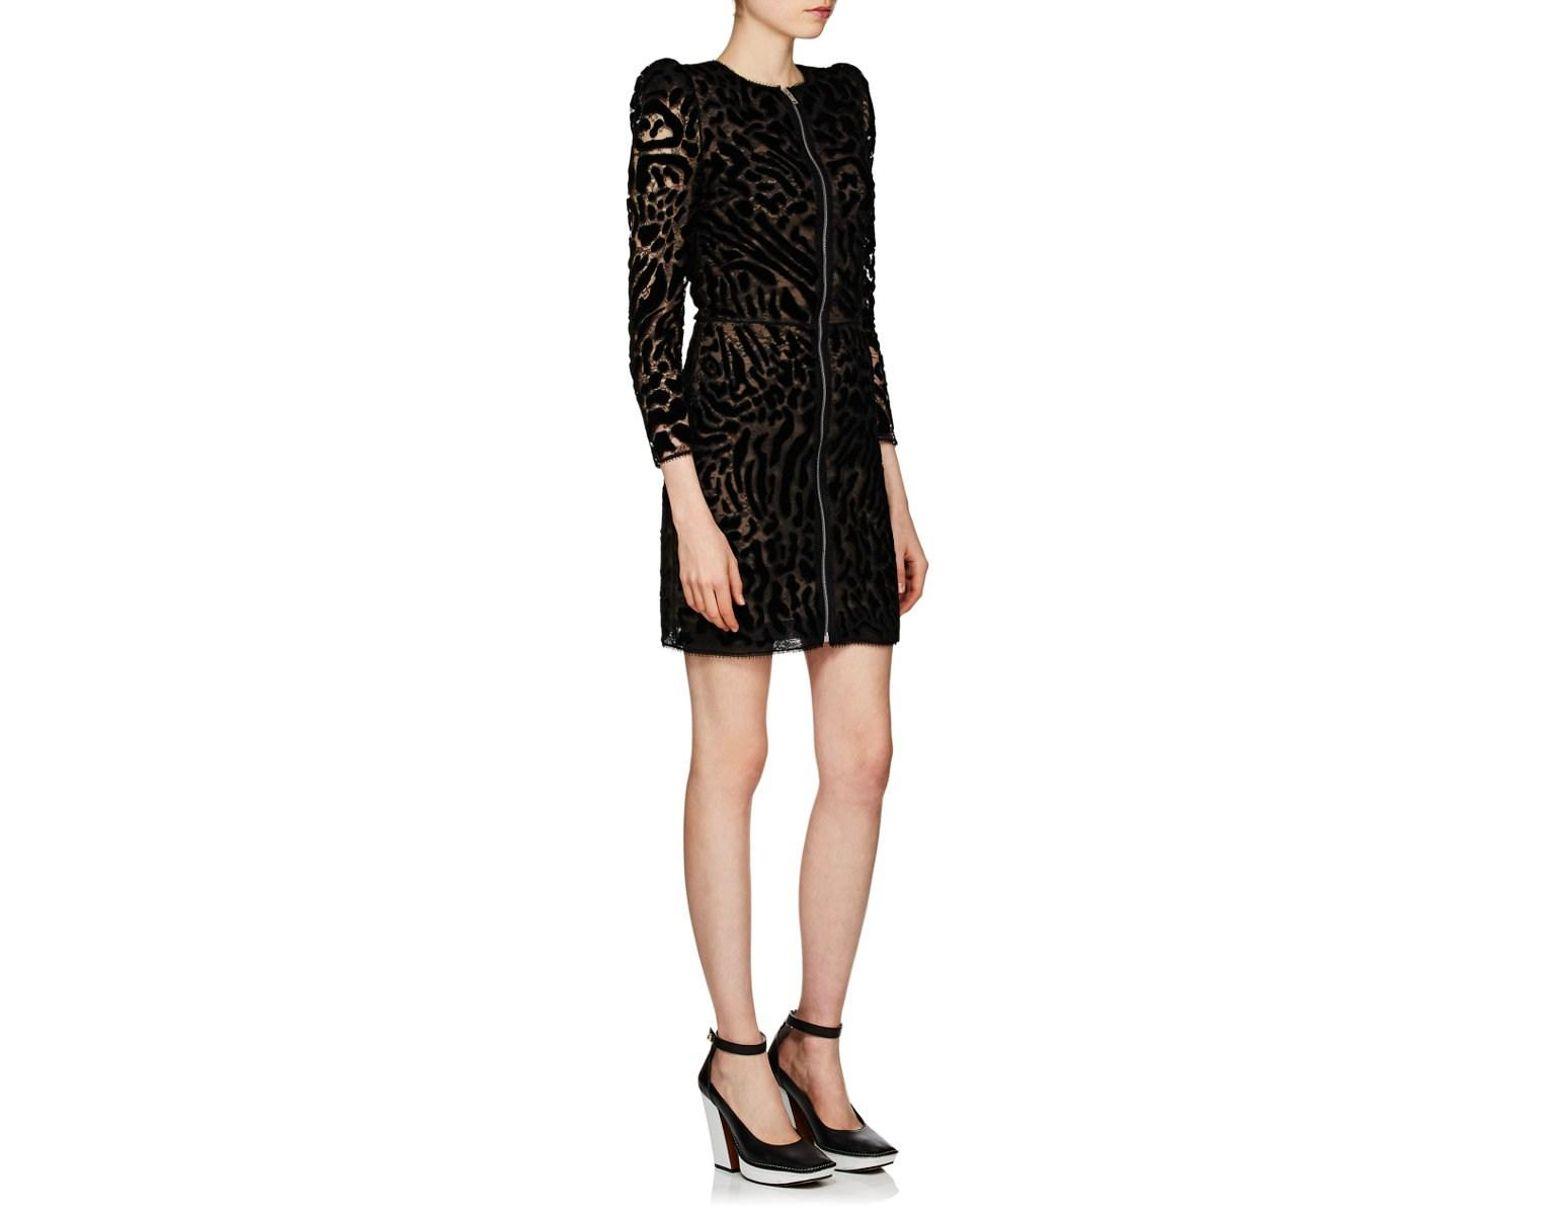 7c4117a077ba Givenchy Leopard-pattern Lace & Velvet Minidress in Black - Save 84% - Lyst